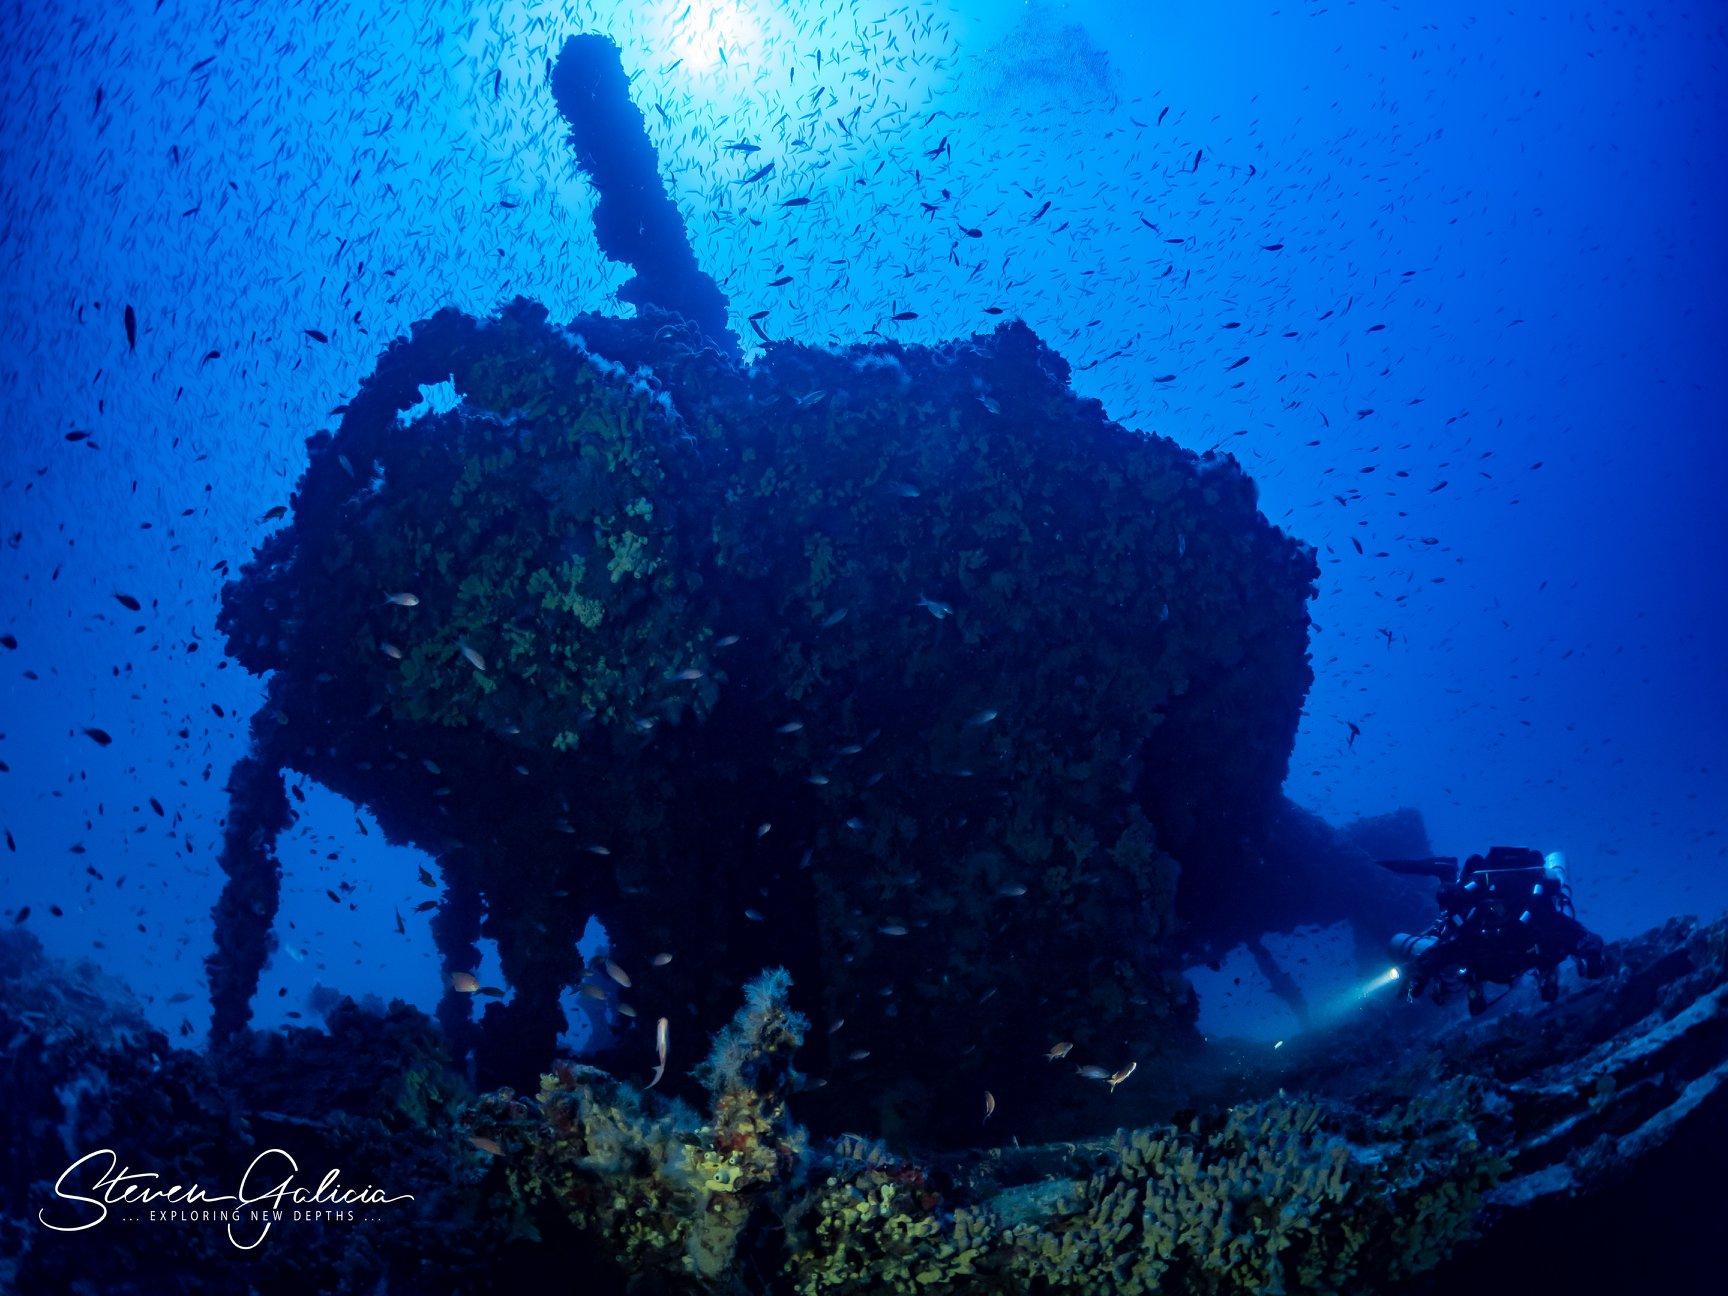 Abundant marine life [Steven Galicia]